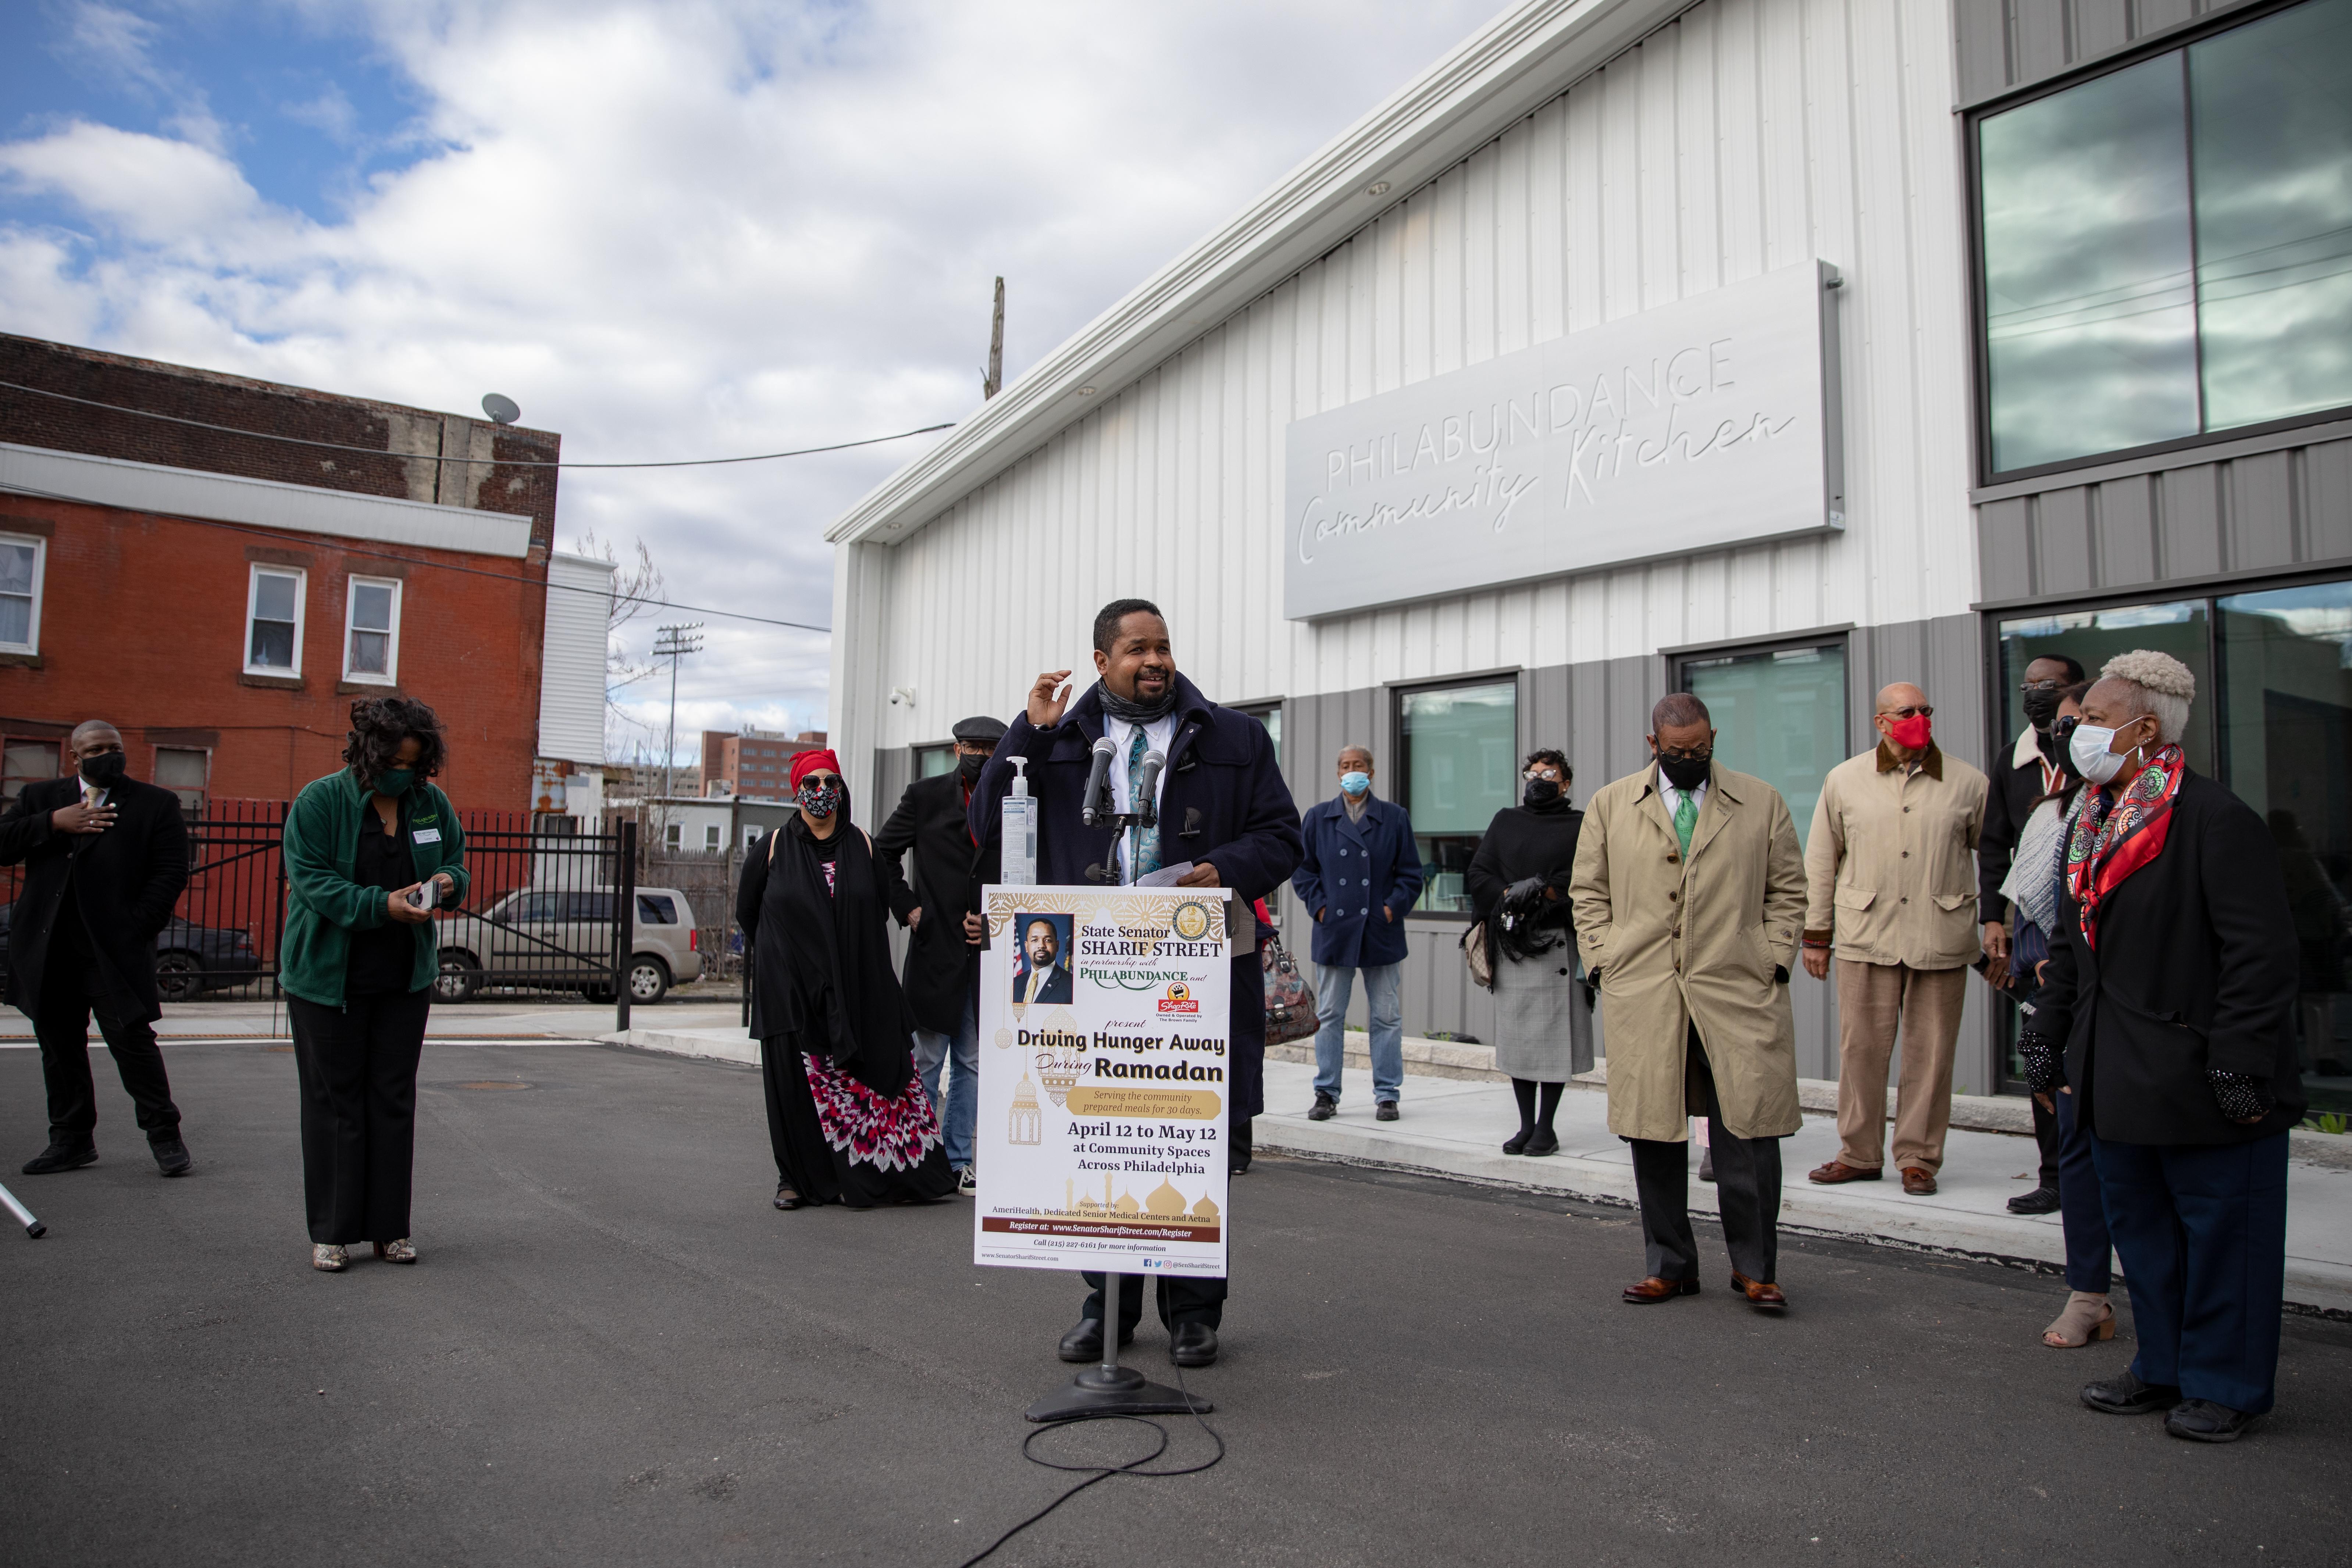 March 29, 2021: Philabundance and Shoprite Partner with Senator Street for 30 Day Food Drive During Ramadan